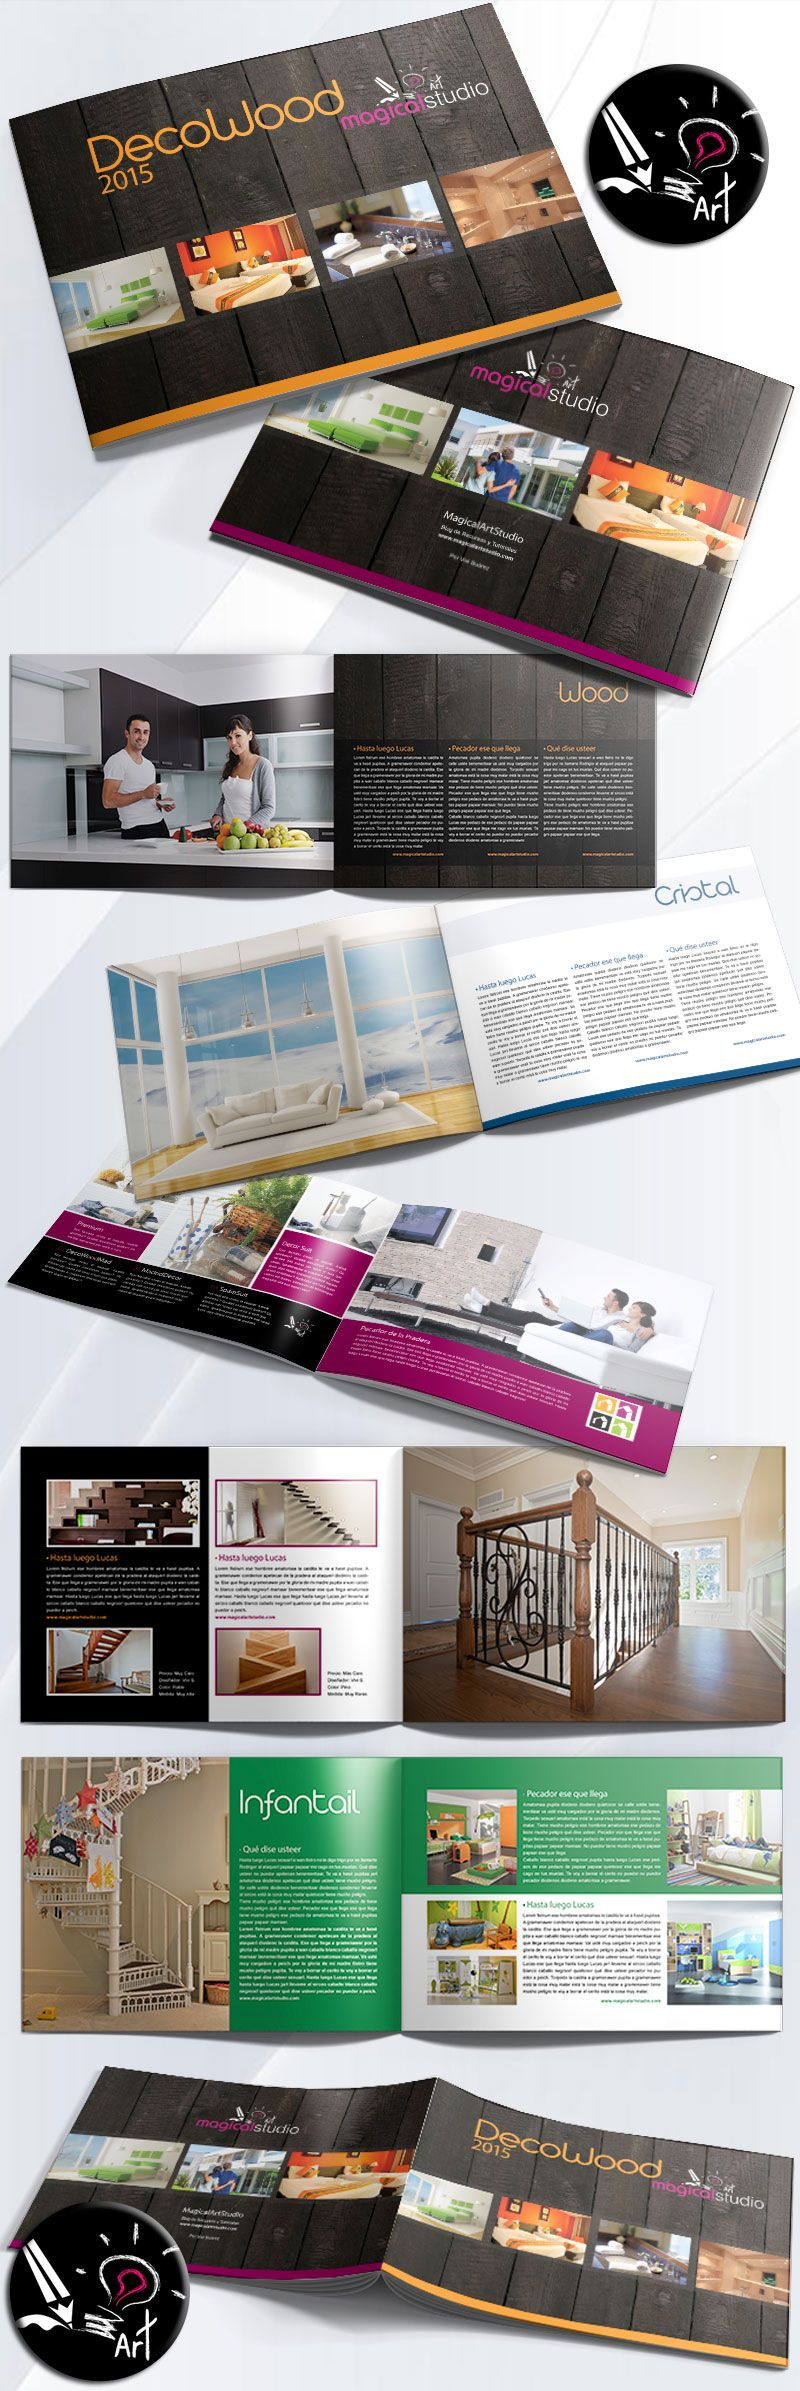 Plantilla Gratuita Catálogo Decoración Interiorismo Indesign ...